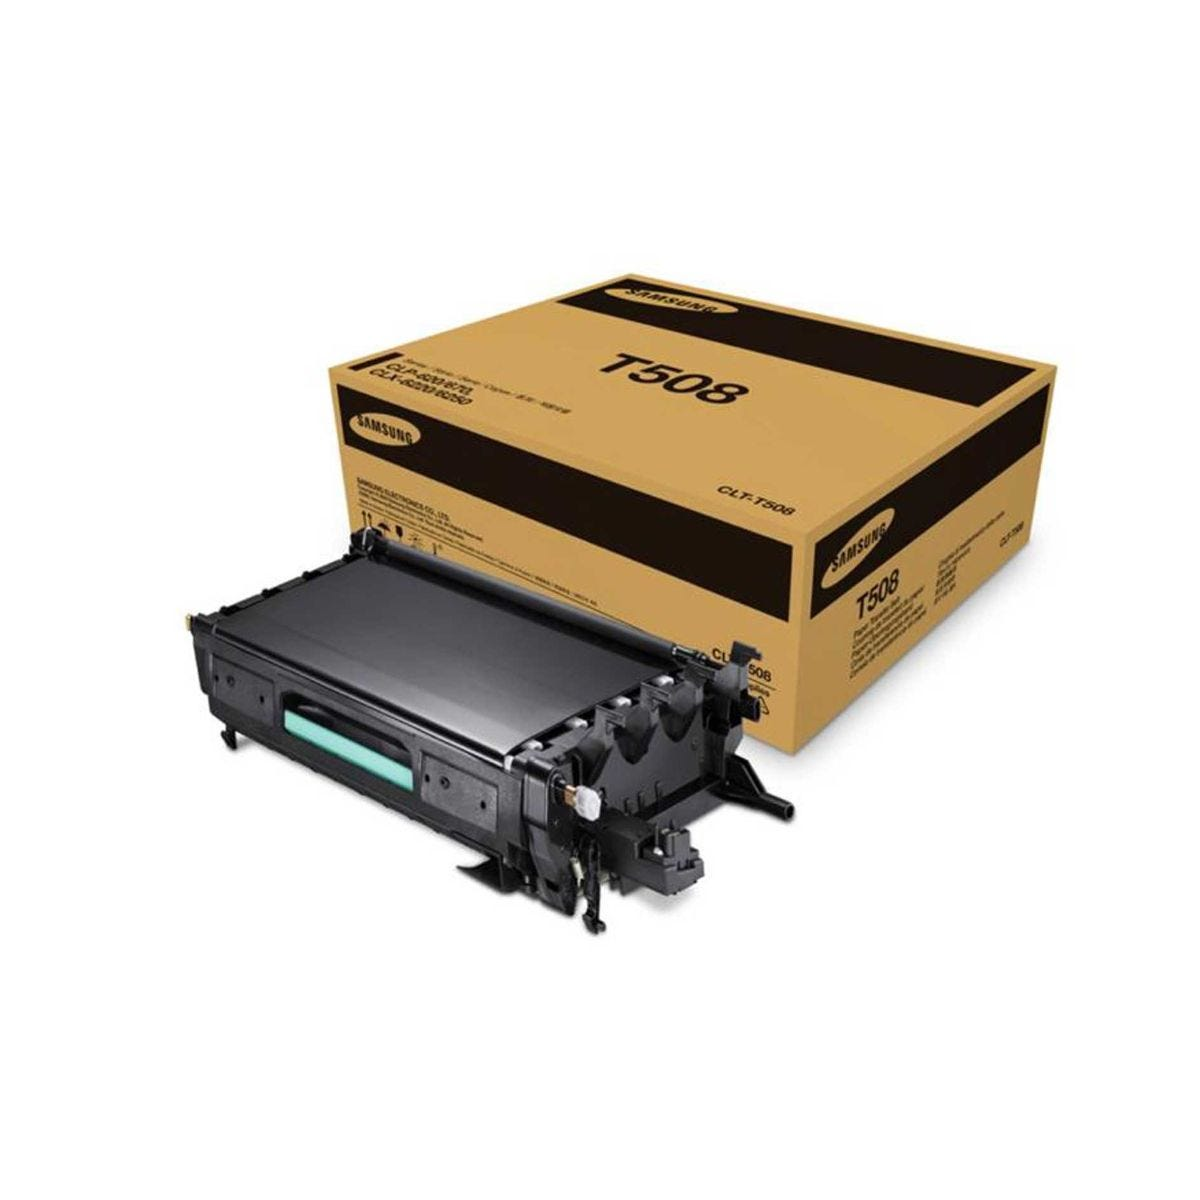 Samsung T508 Imaging Transfer Belt CLT-T508/SEE